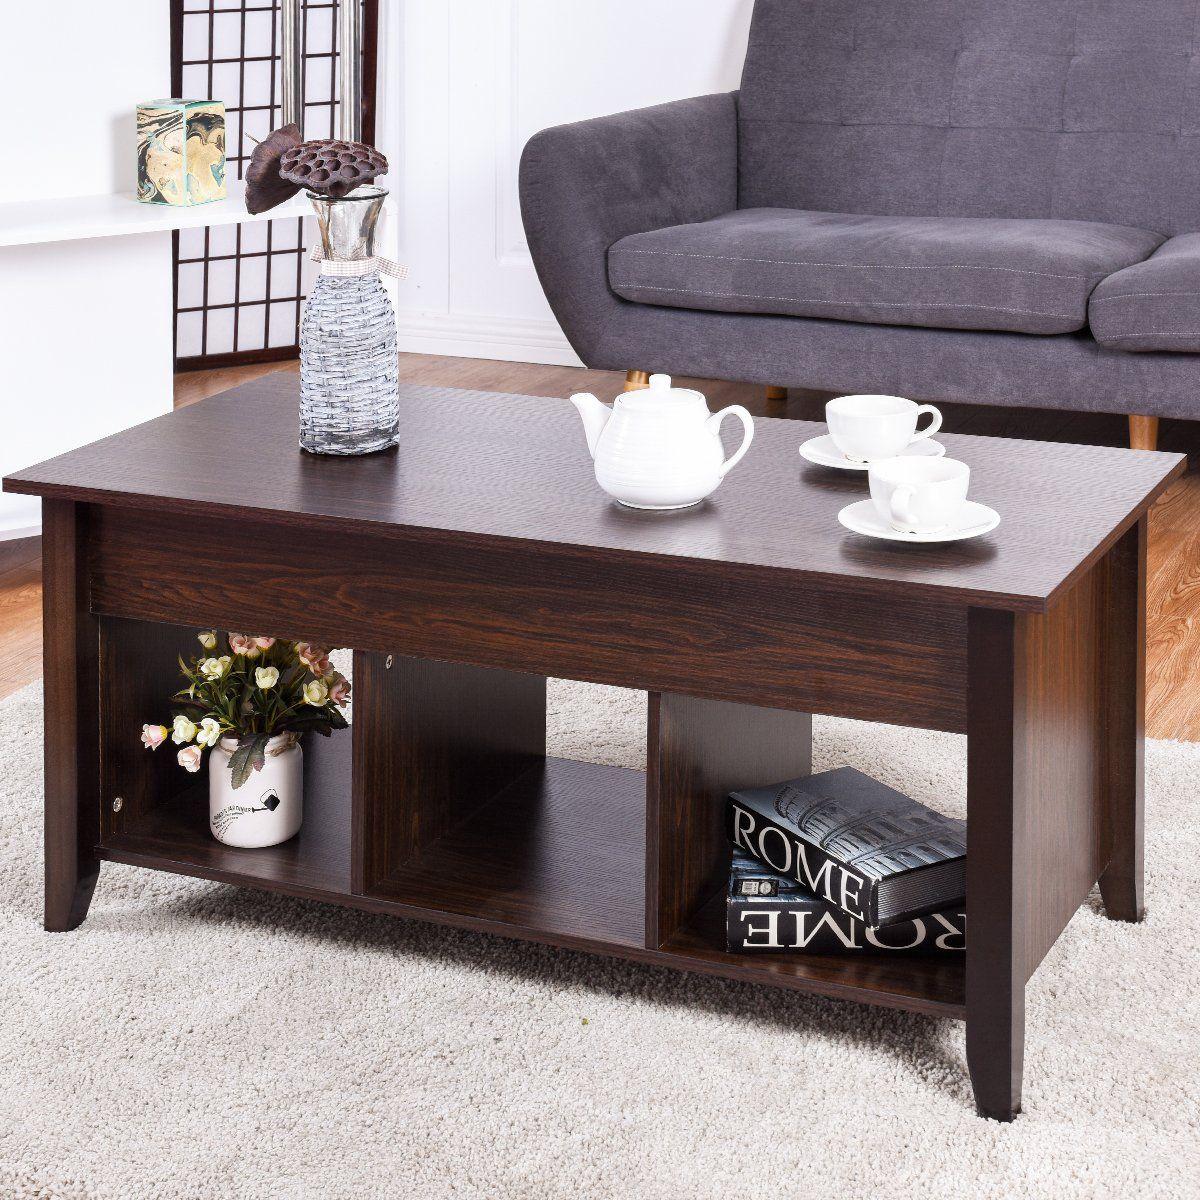 Tangkula Coffee Table Lift Top Wood Home Living Room Modern Lift Top Storage Coffee Table W Hidden Com Coffee Table Wood Furniture Living Room Living Room Wood [ 1200 x 1200 Pixel ]